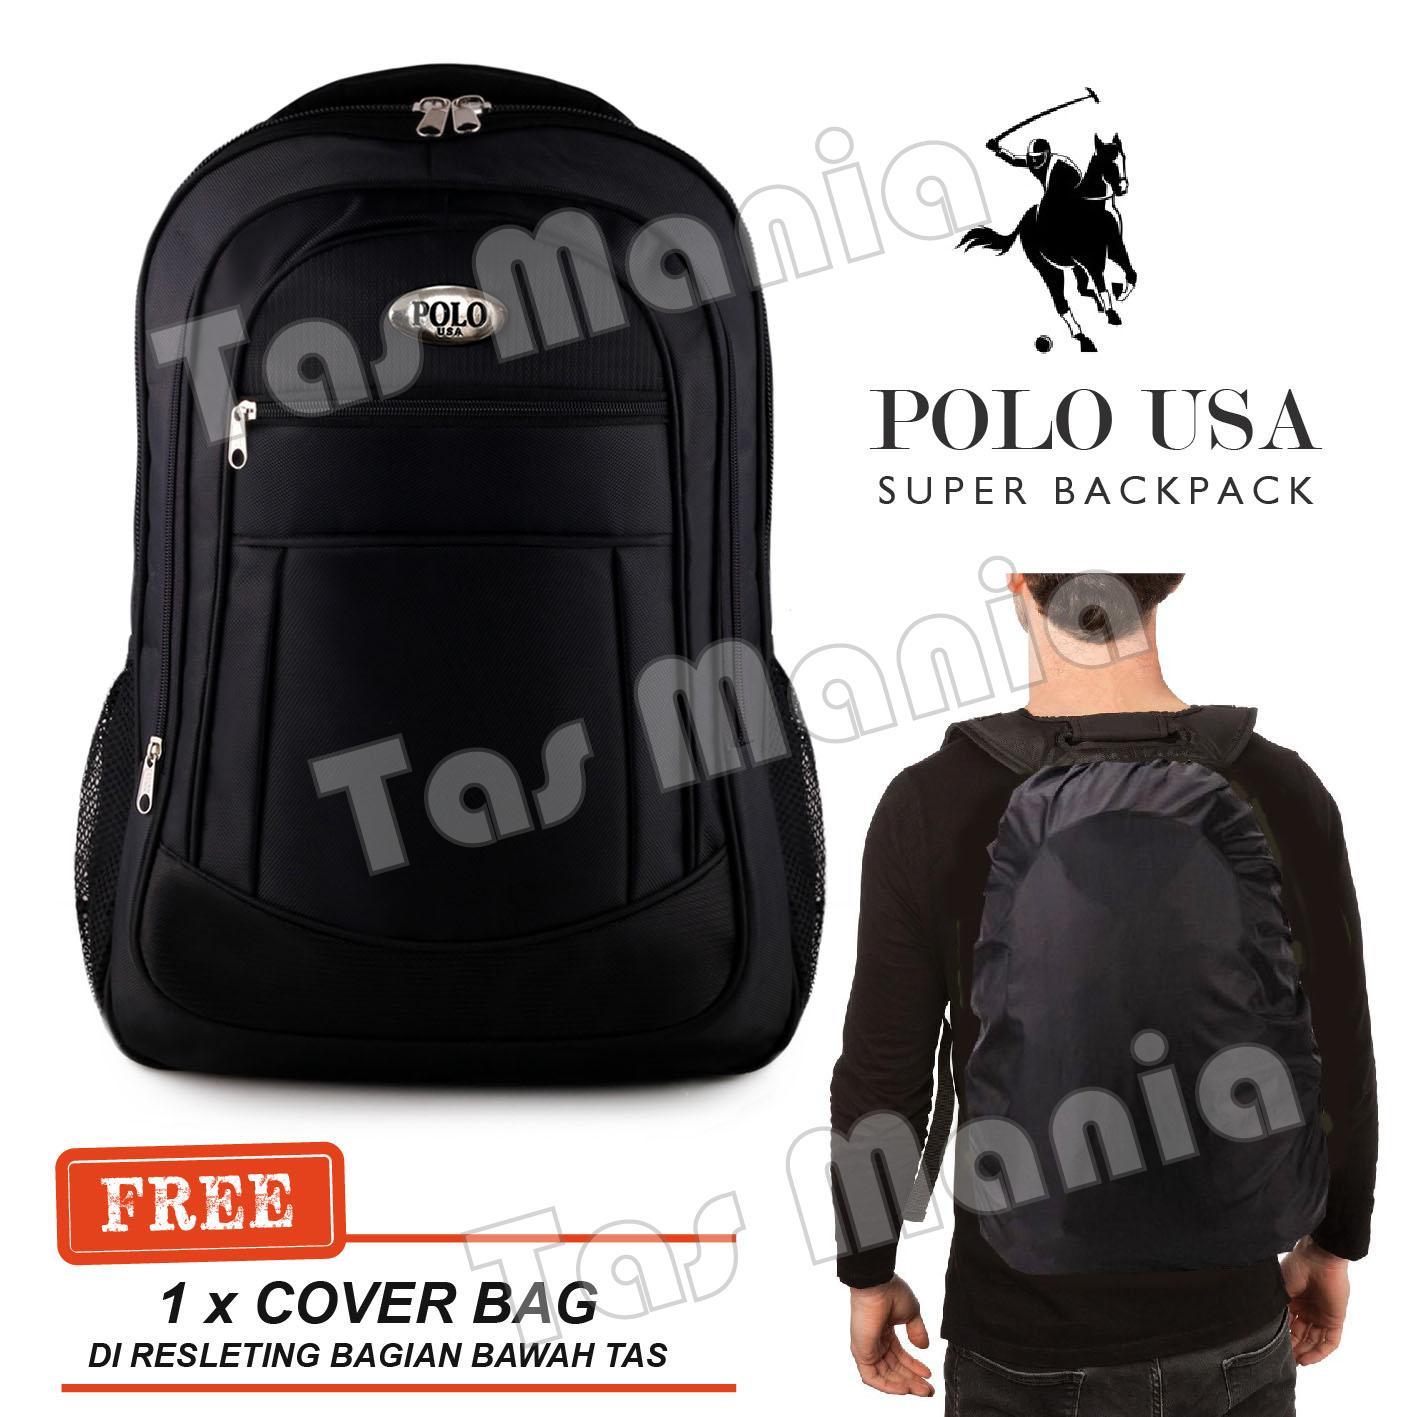 Tas Ransel Pria Polo USA Laptop Backpack + FREE Raincover Promo Diskon  Import Kulit Tas Kantor d2a27201a2